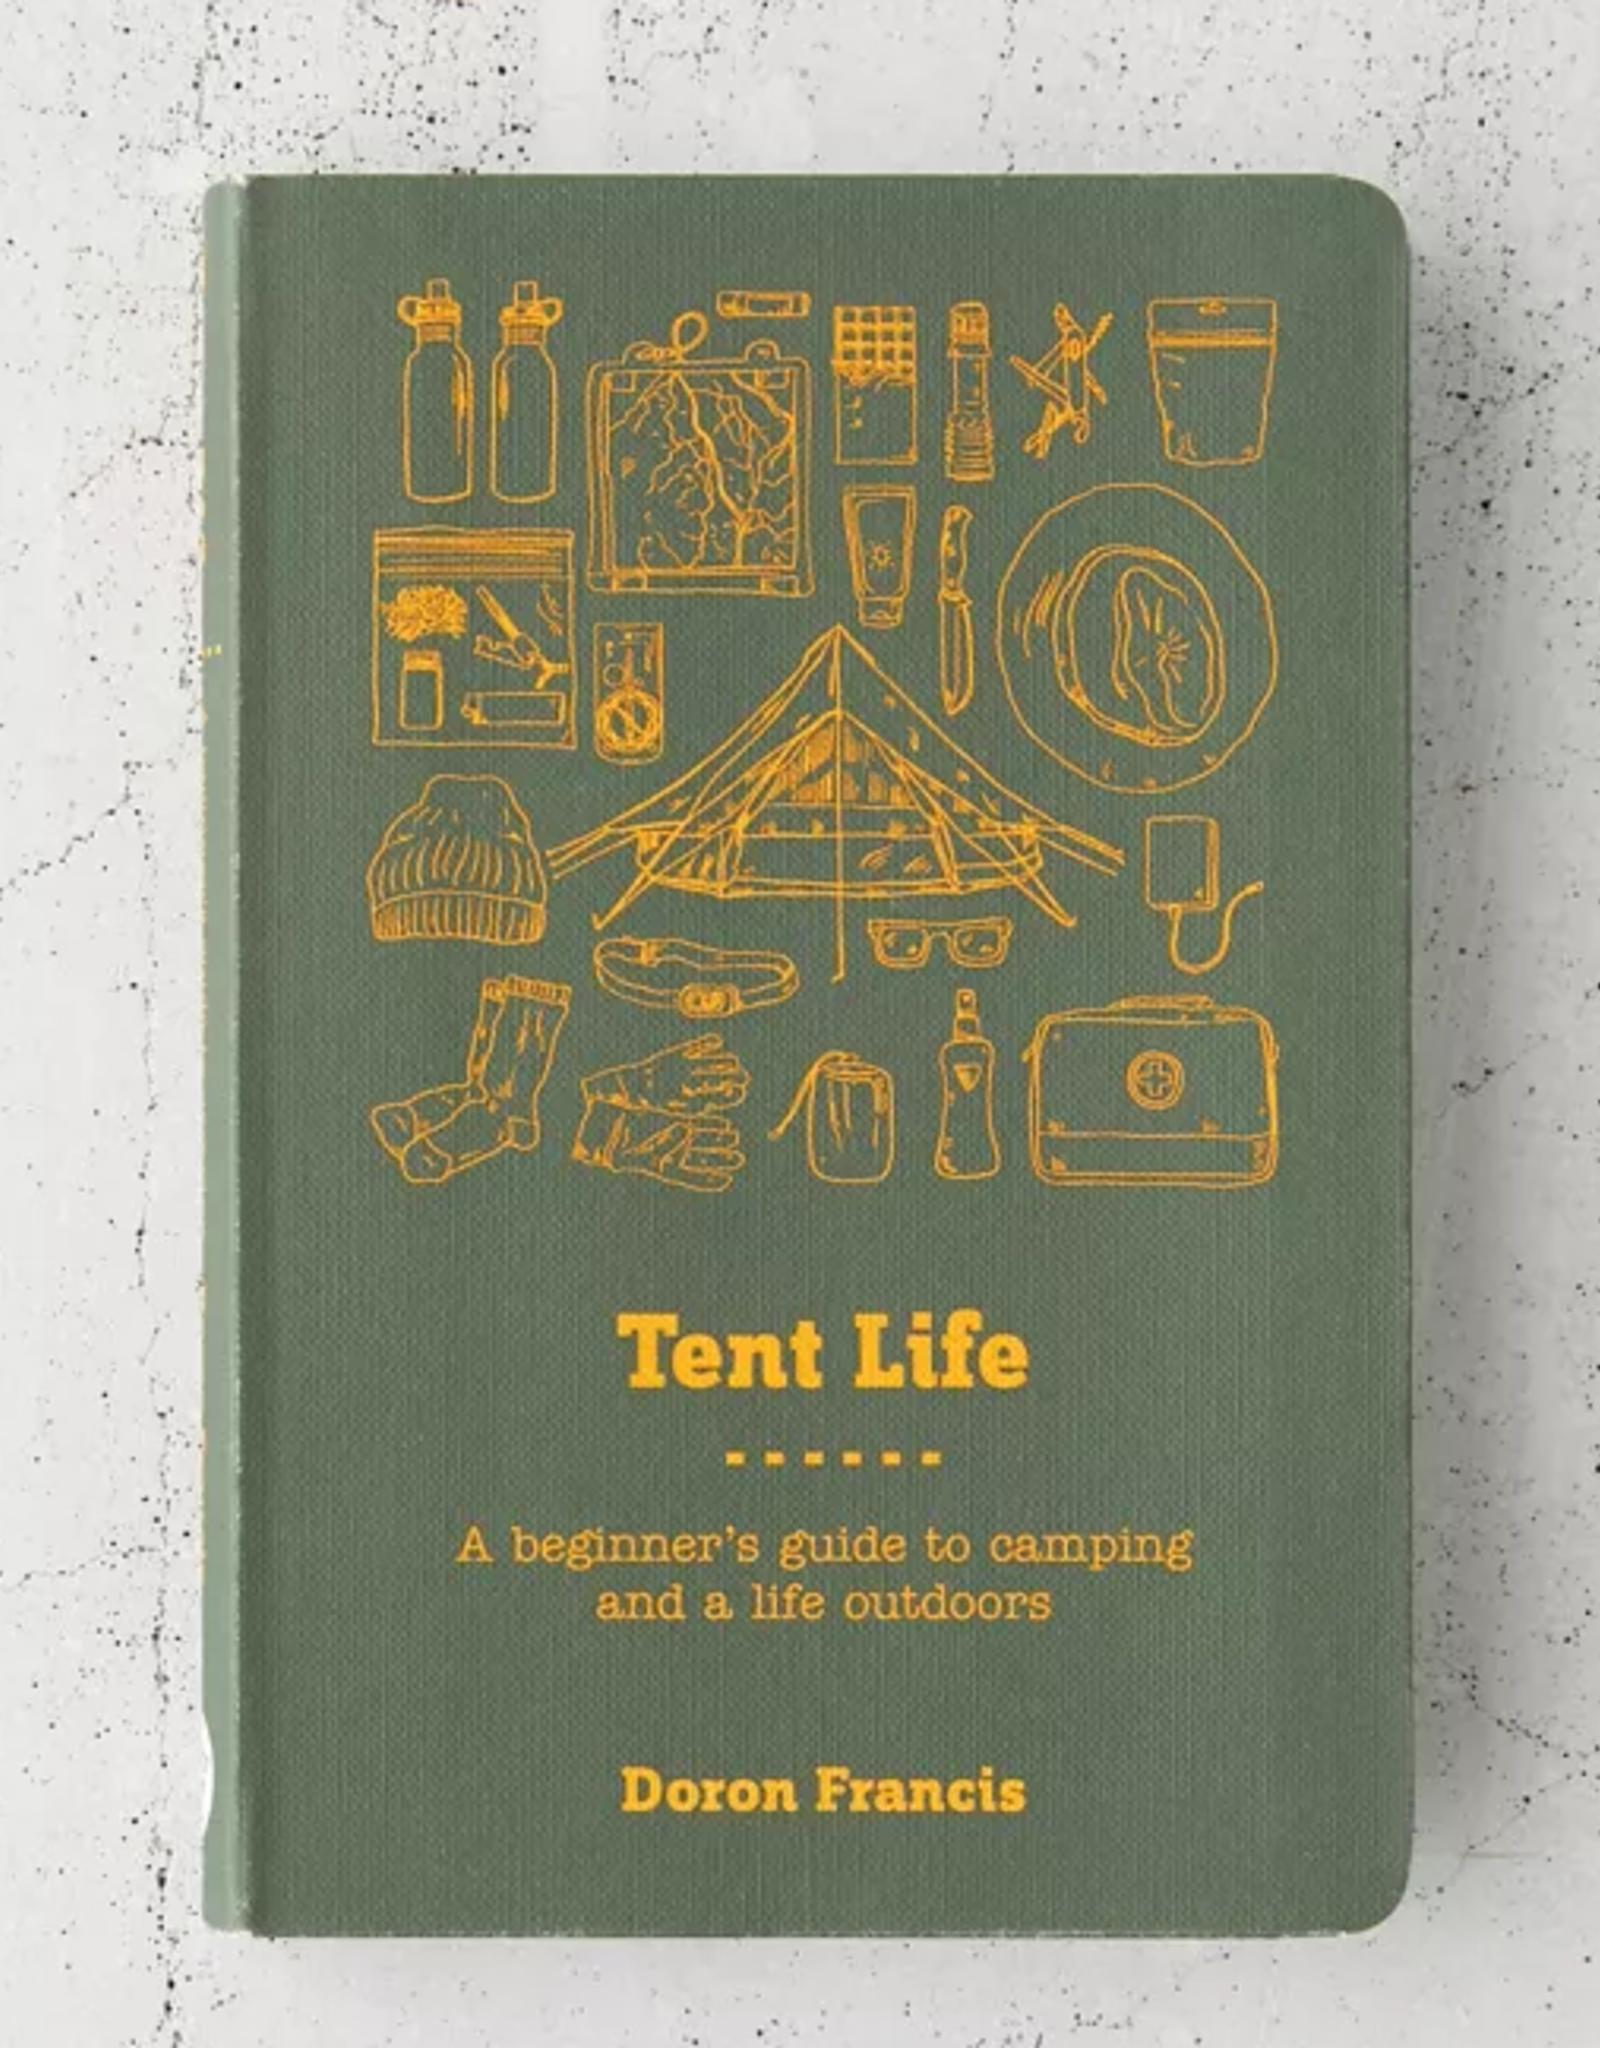 CHRONICLE BOOKS TENT LIFE